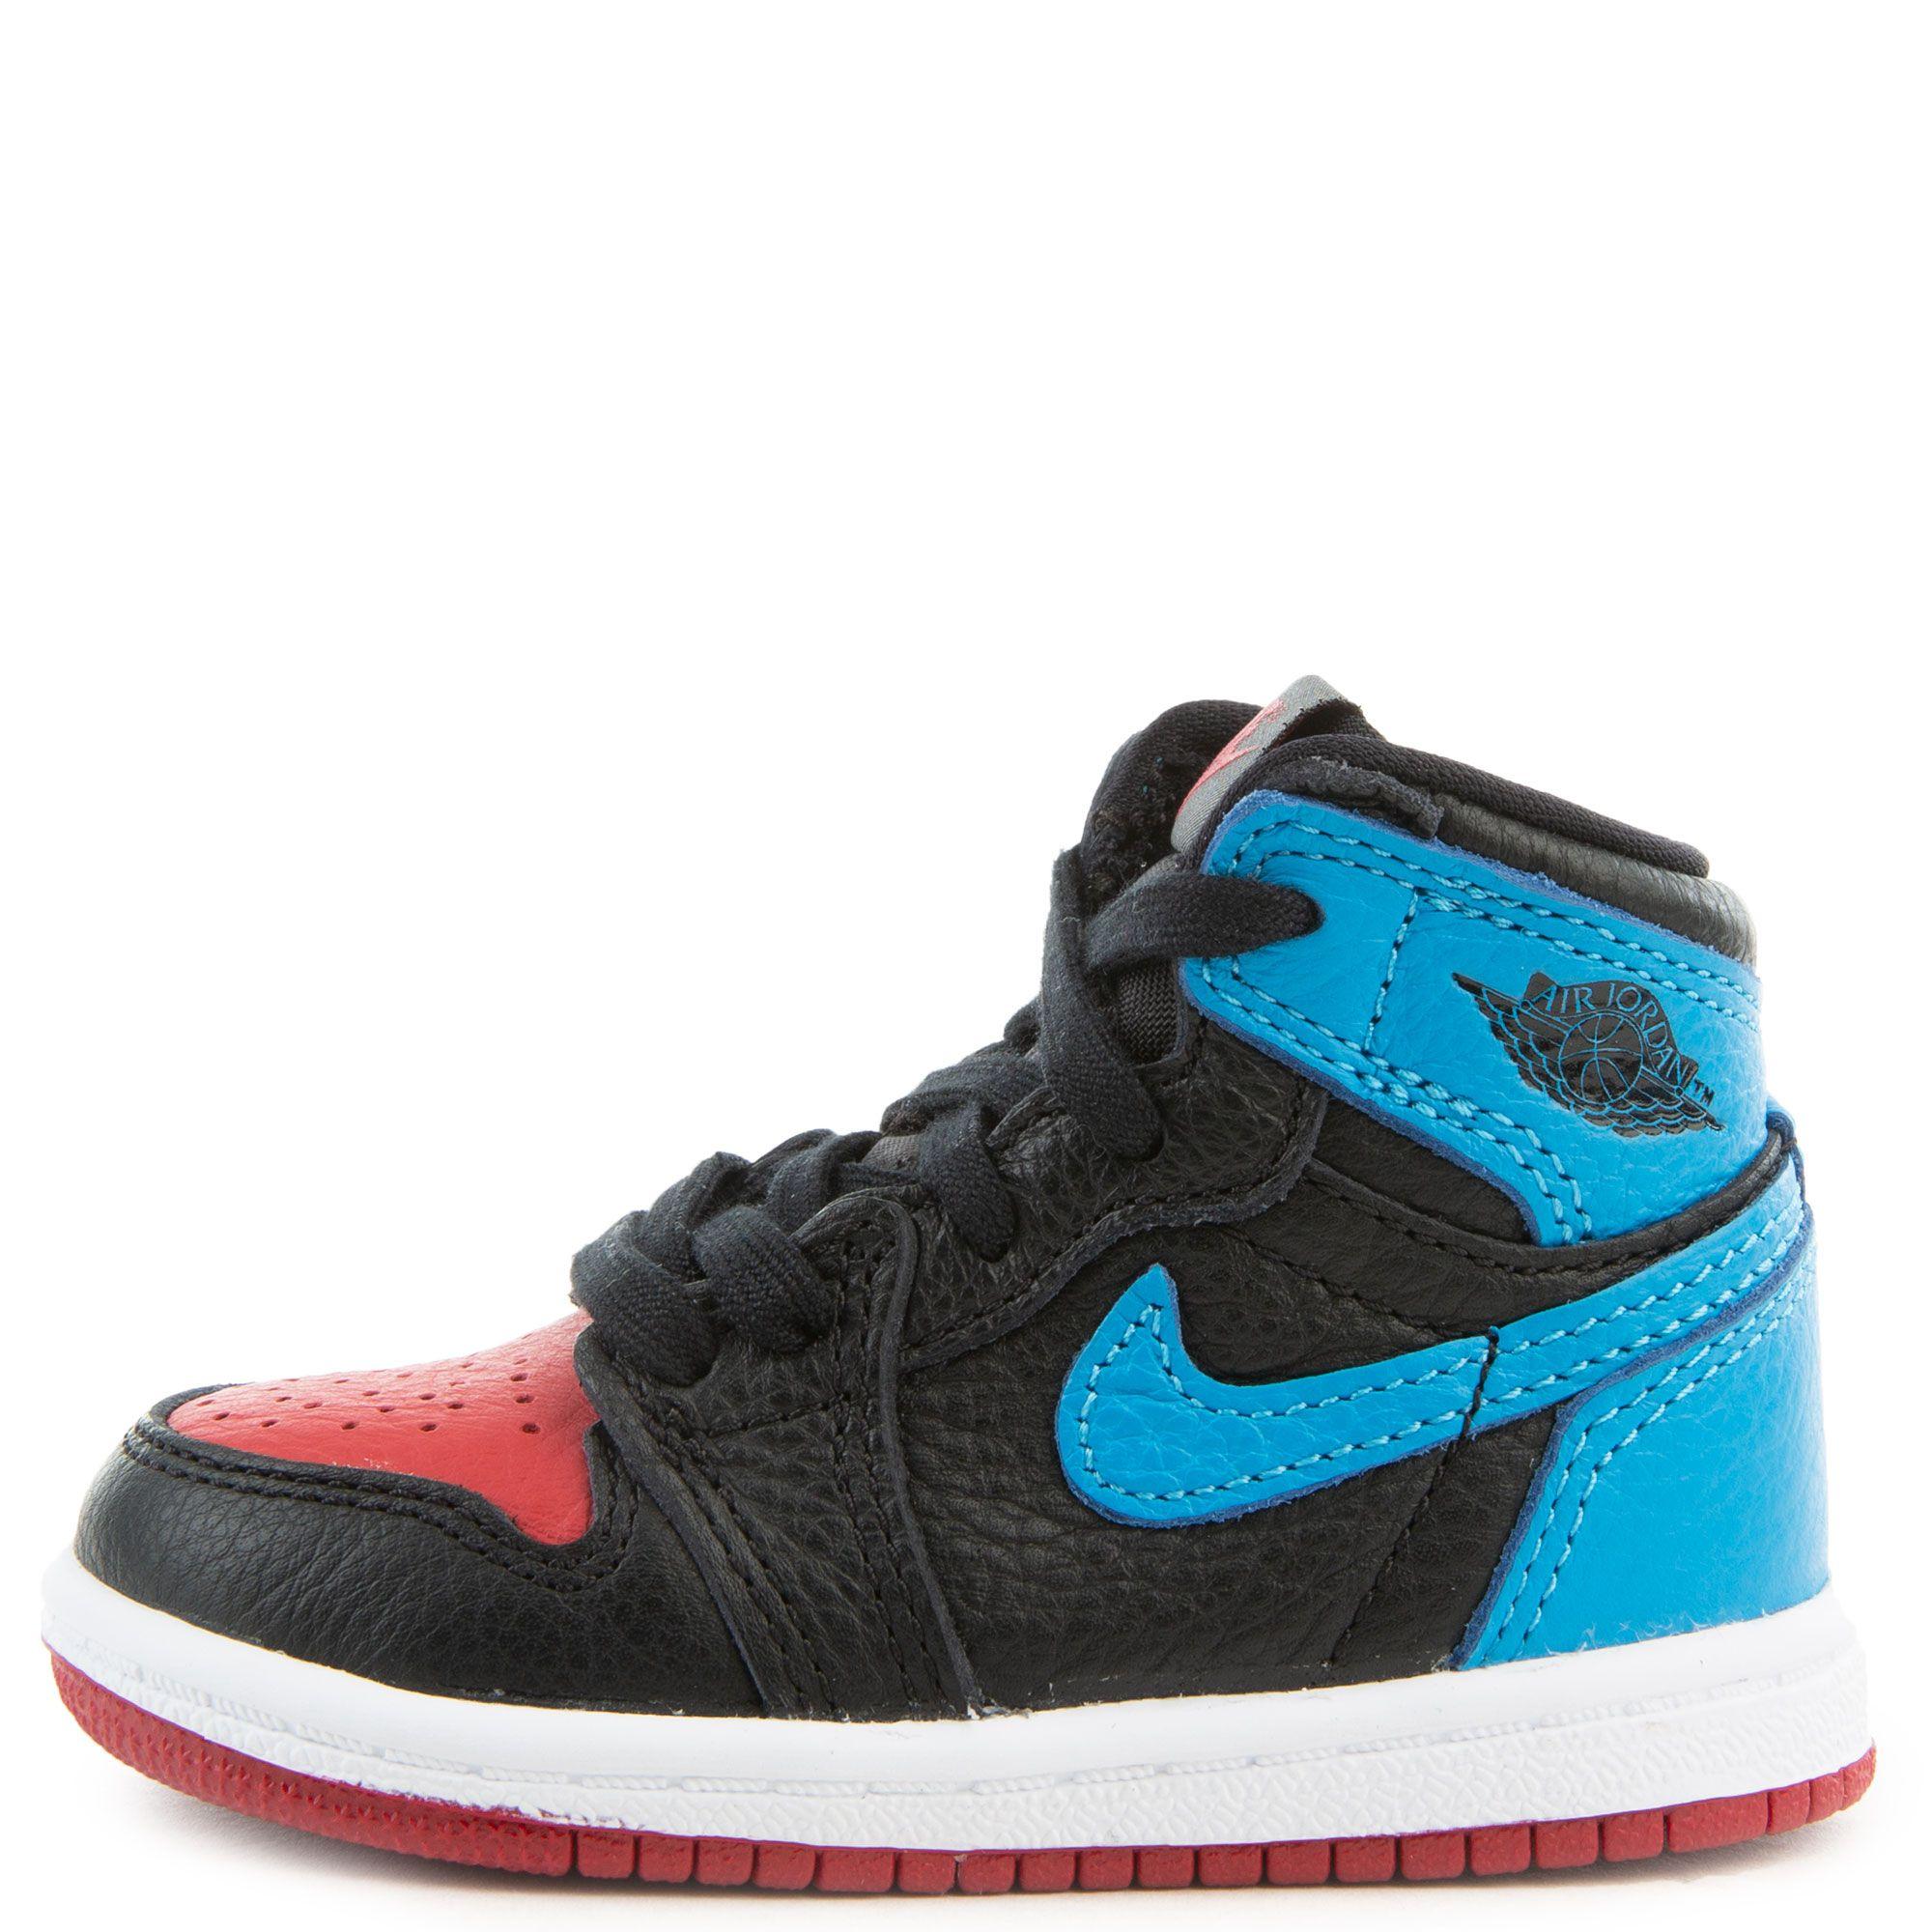 Td Air Jordan 1 High Og Black Dk Powder Blue Varsity Red